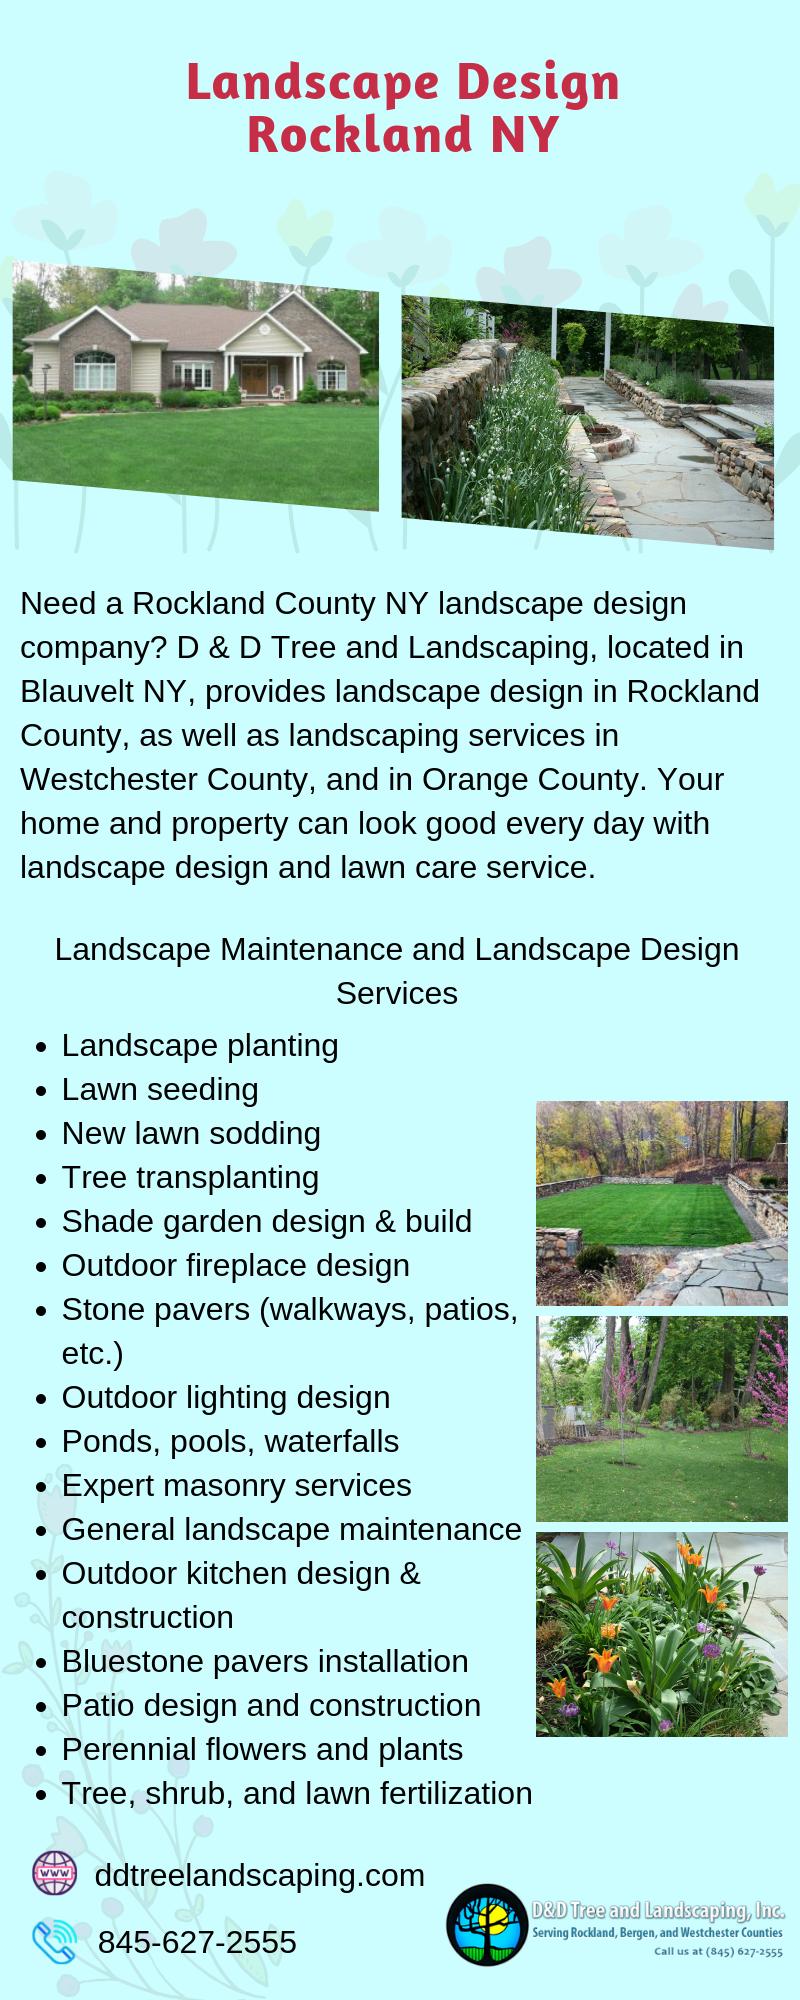 D D Tree And Landscaping Inc Is Offering The Best Landscape Design In Rockland Ny We Landscape Design Services Commercial Landscape Design Landscape Design